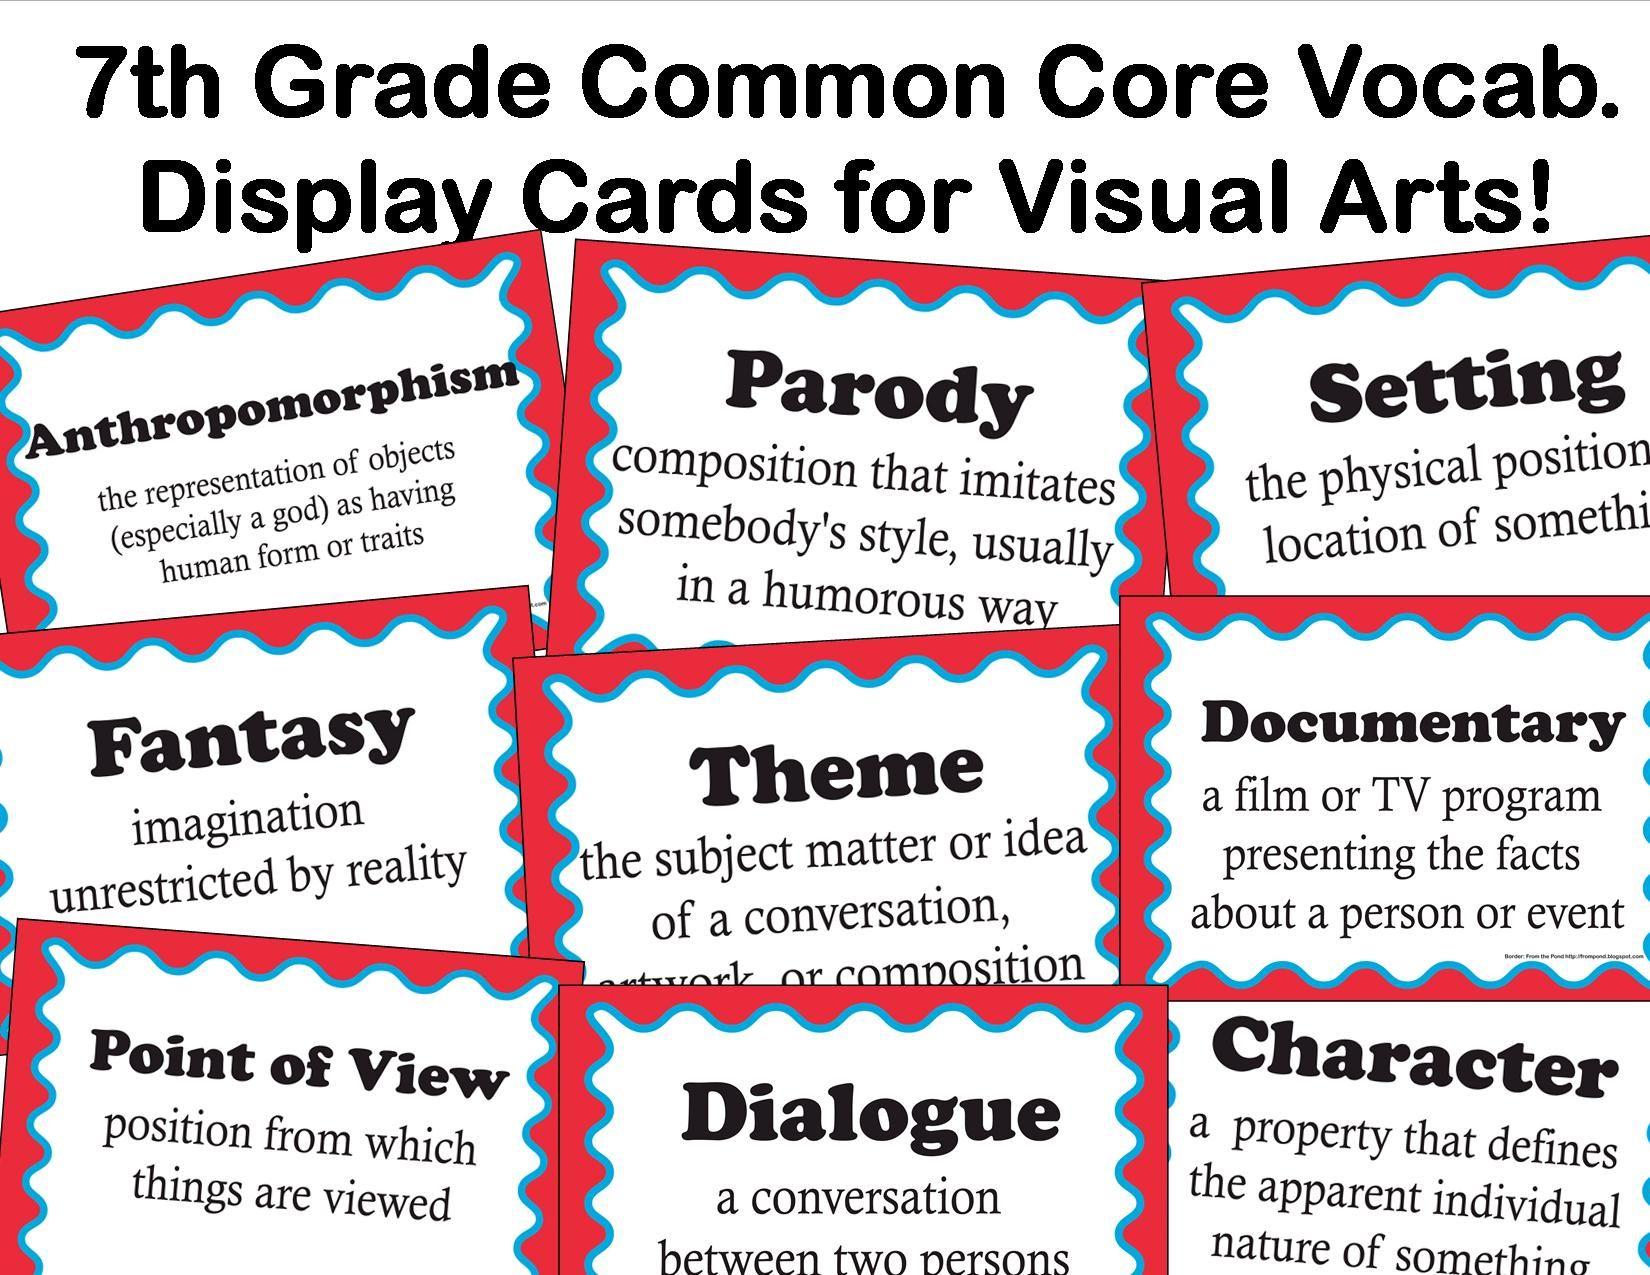 The Smartteacher Resource Common Core Language Arts Vocabulary For Visual Arts For 7th Grade